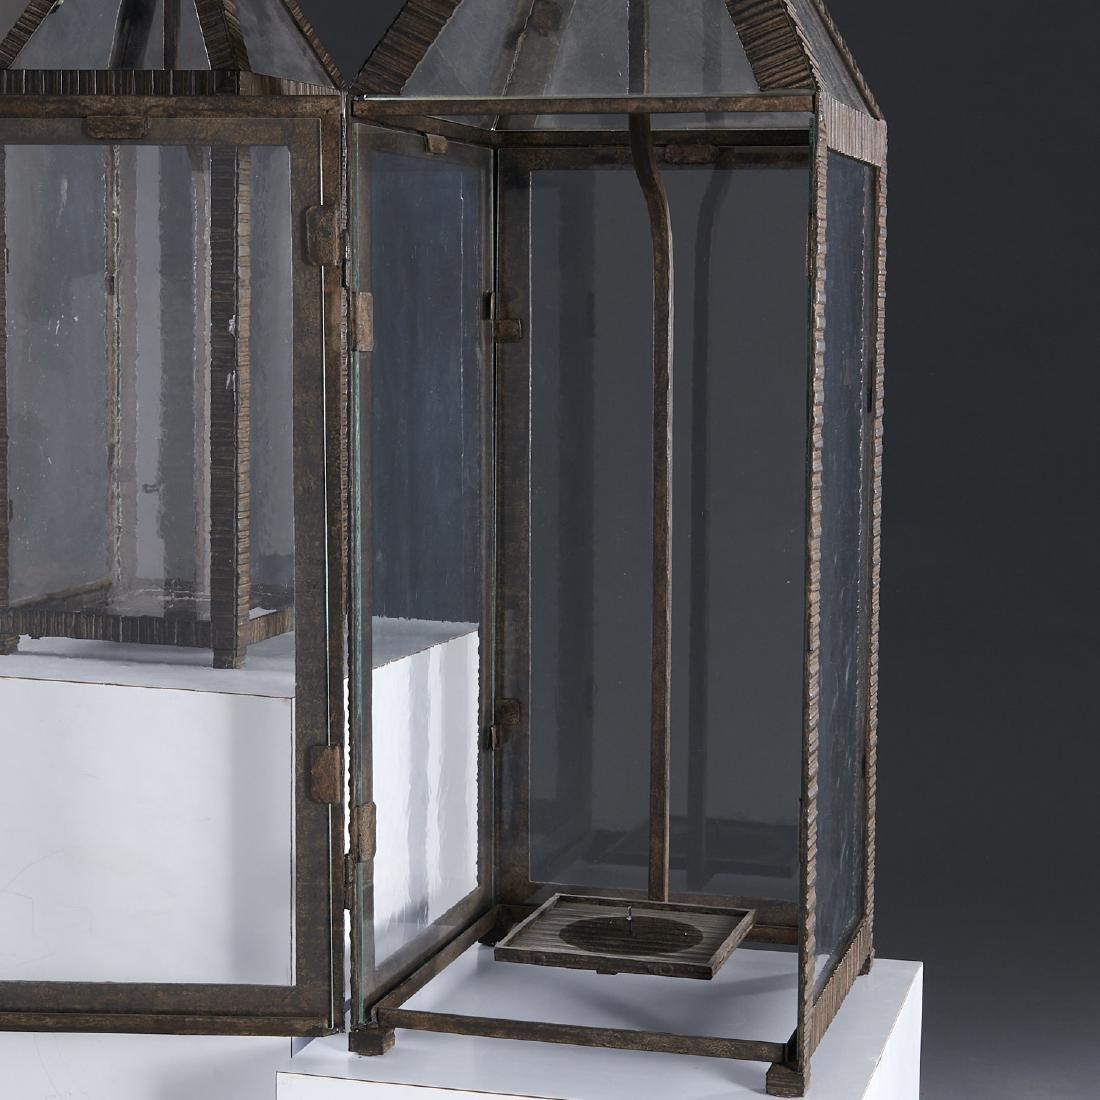 (2) WP Sullivan (attib.) designer hanging lanterns - 3